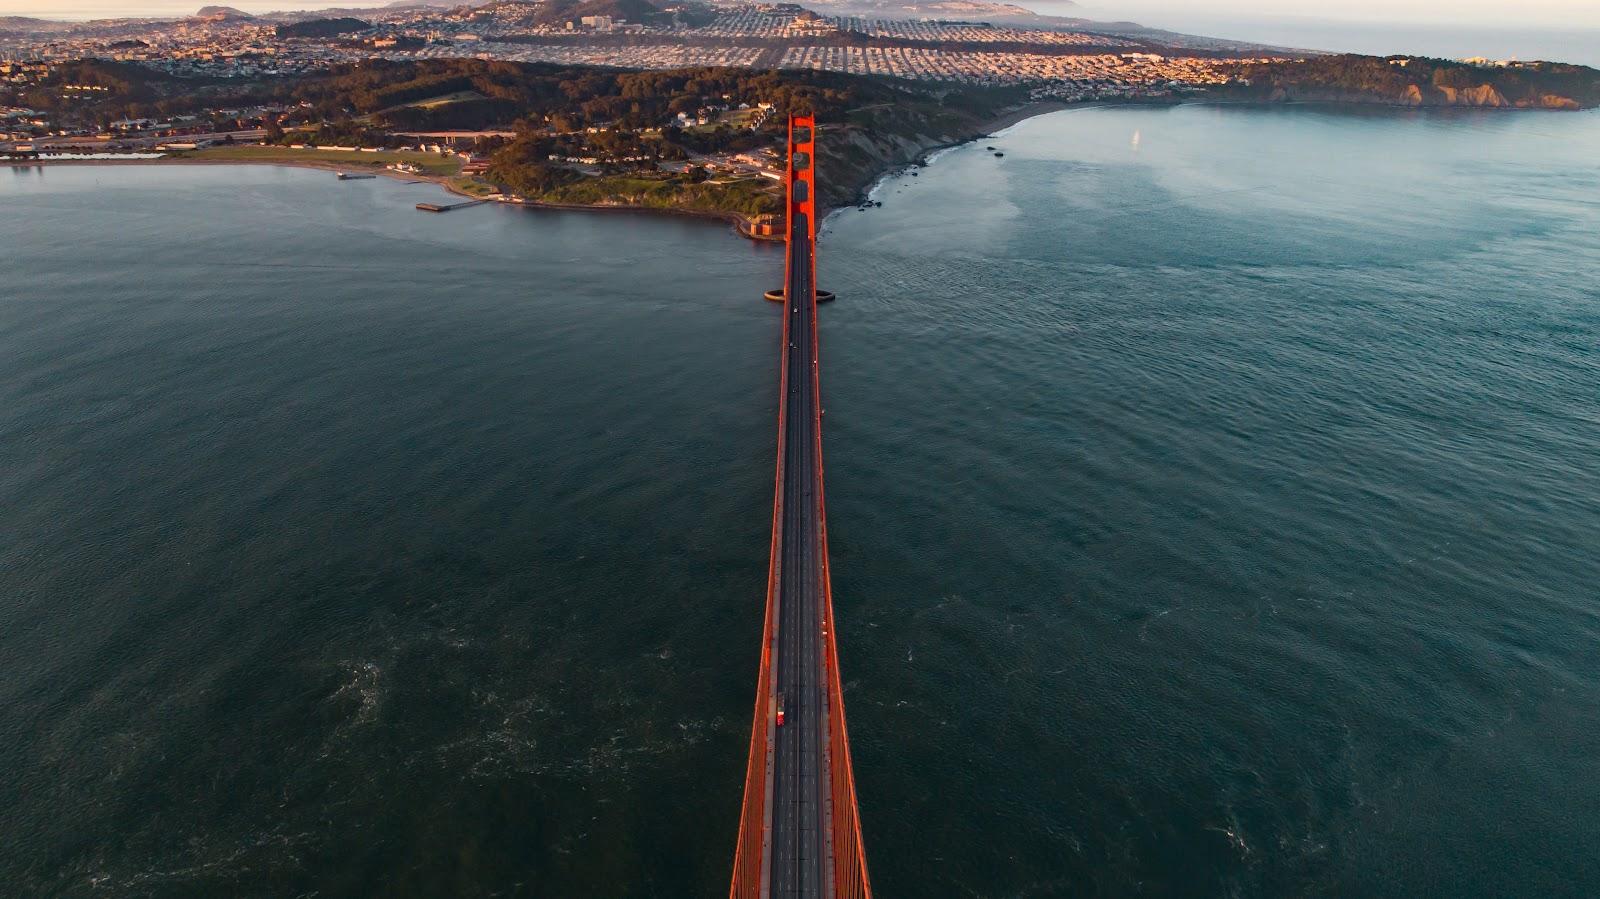 Drone aerial photo above the Golden Gate Bridge